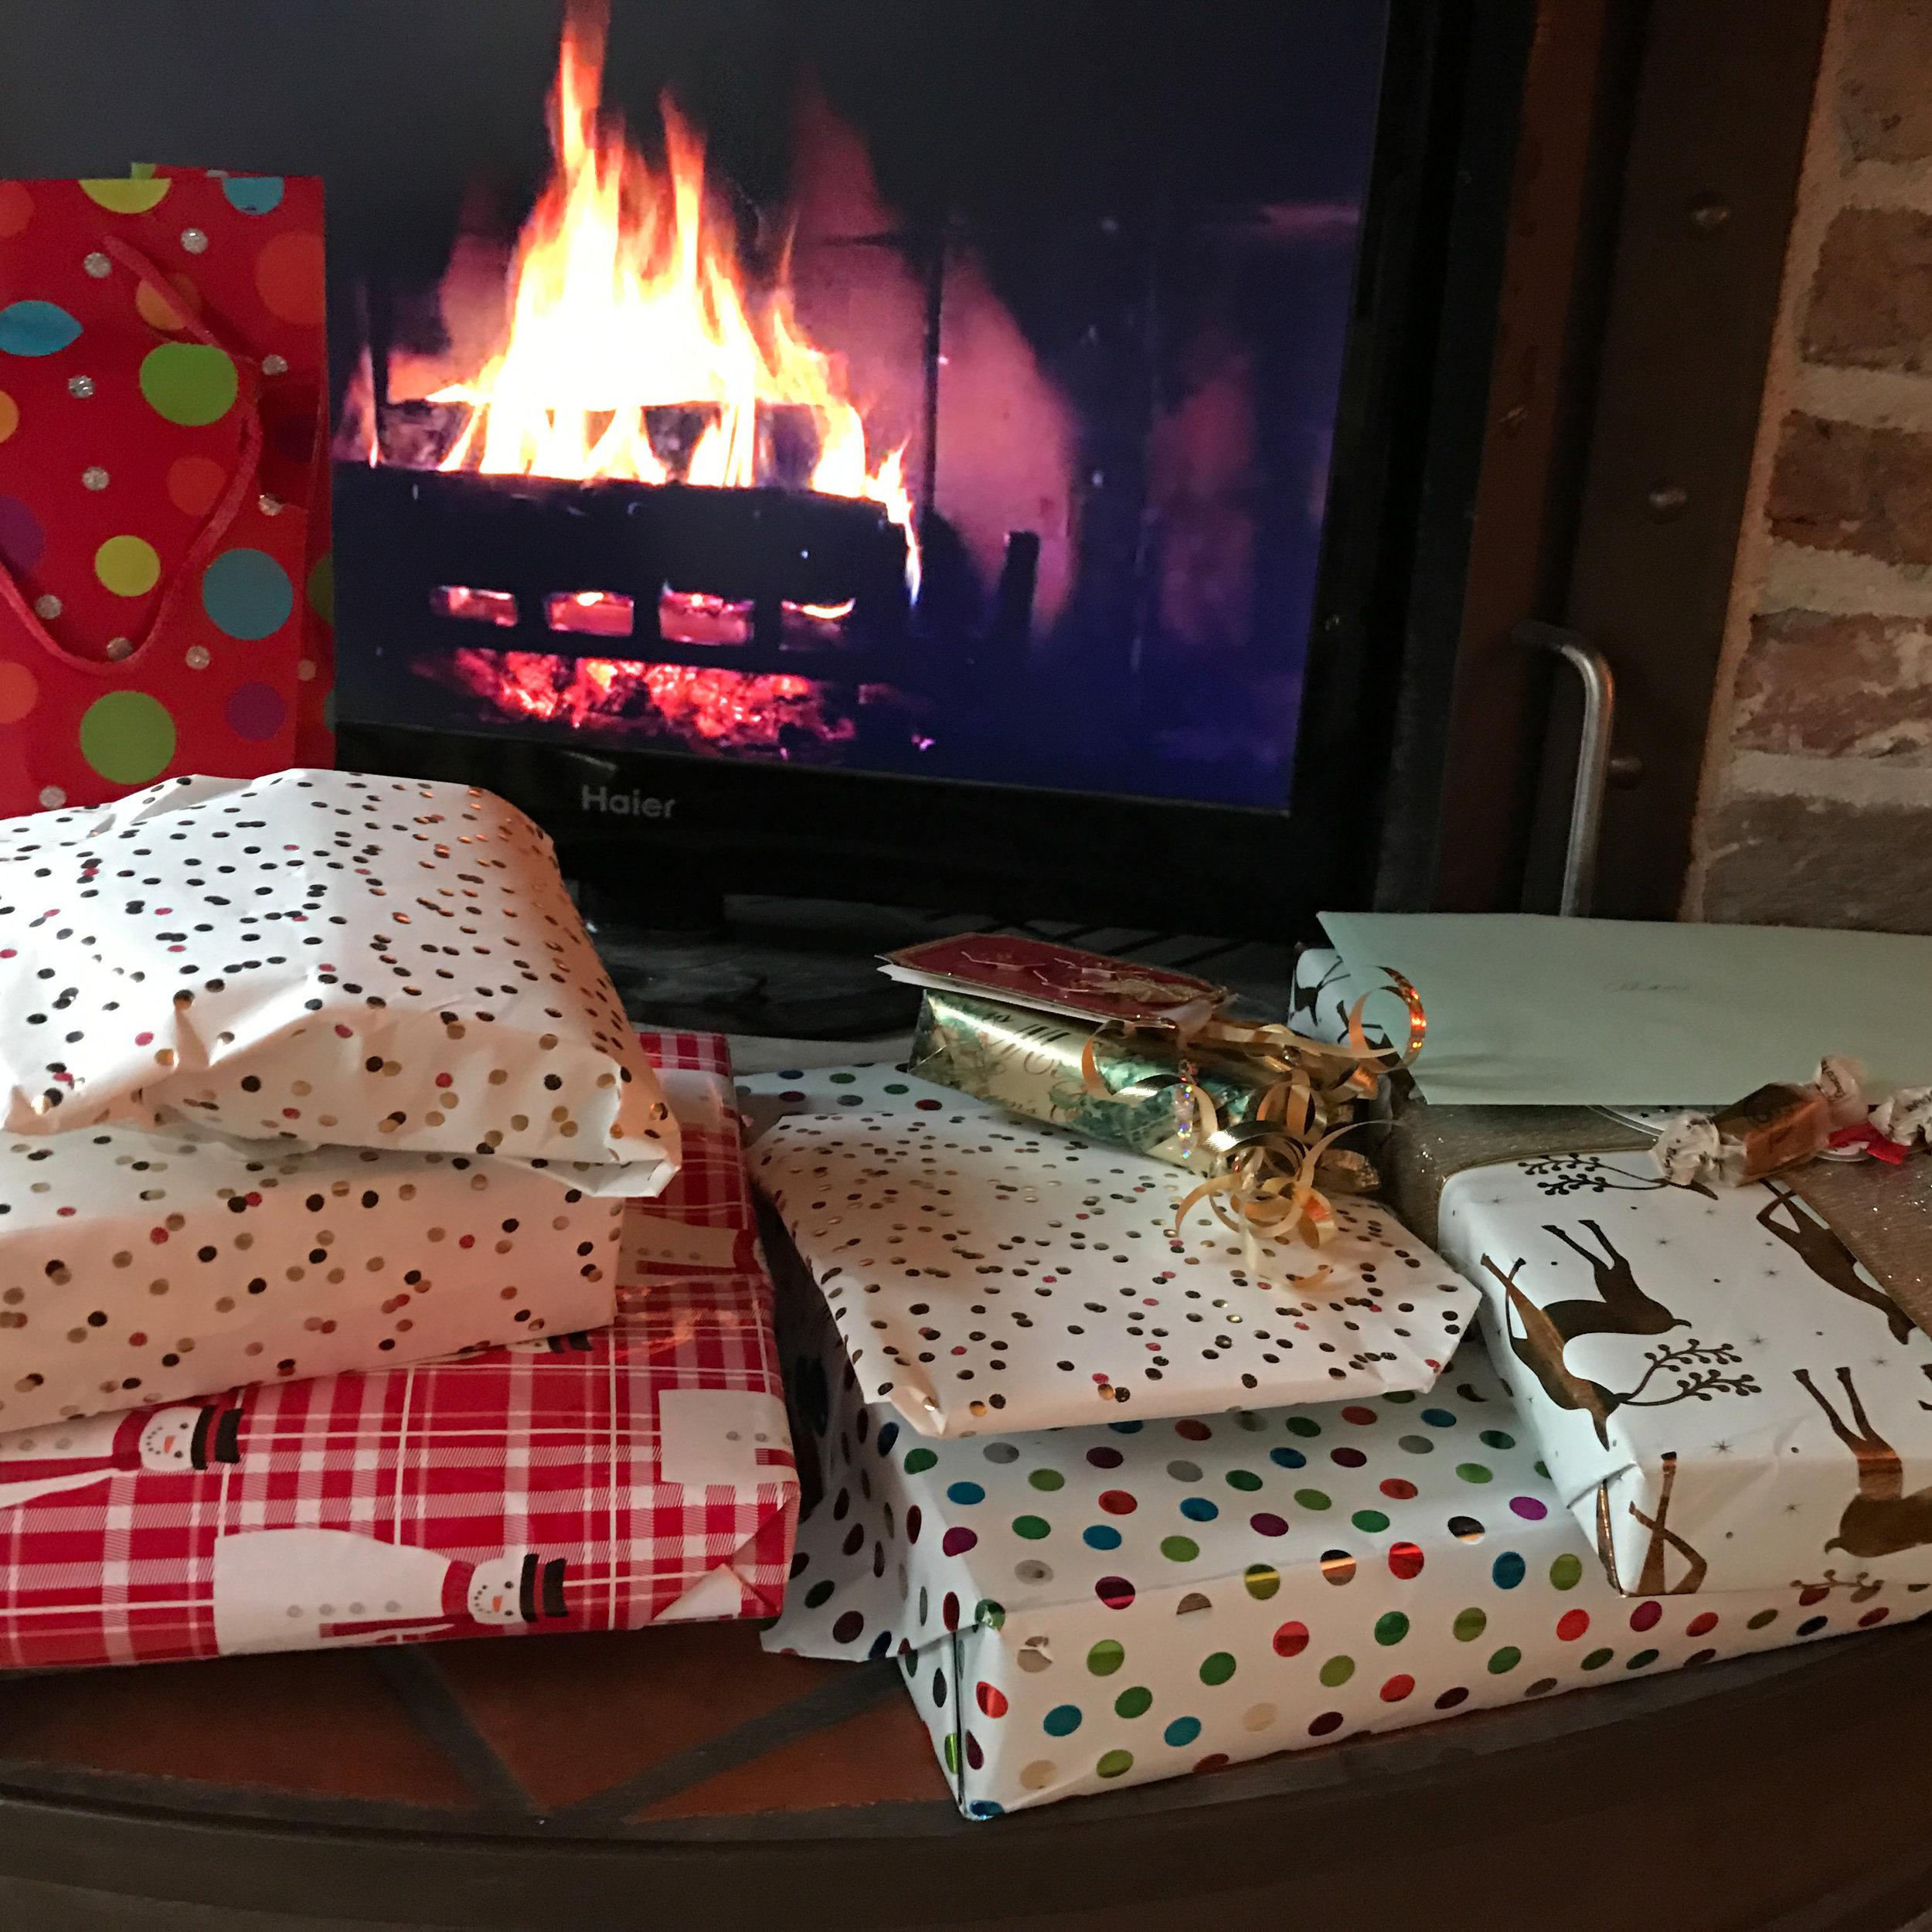 Belgium, Christmas Belgium, Belgian expat, expat Christmas, American in Belgium, Gent, American Gent